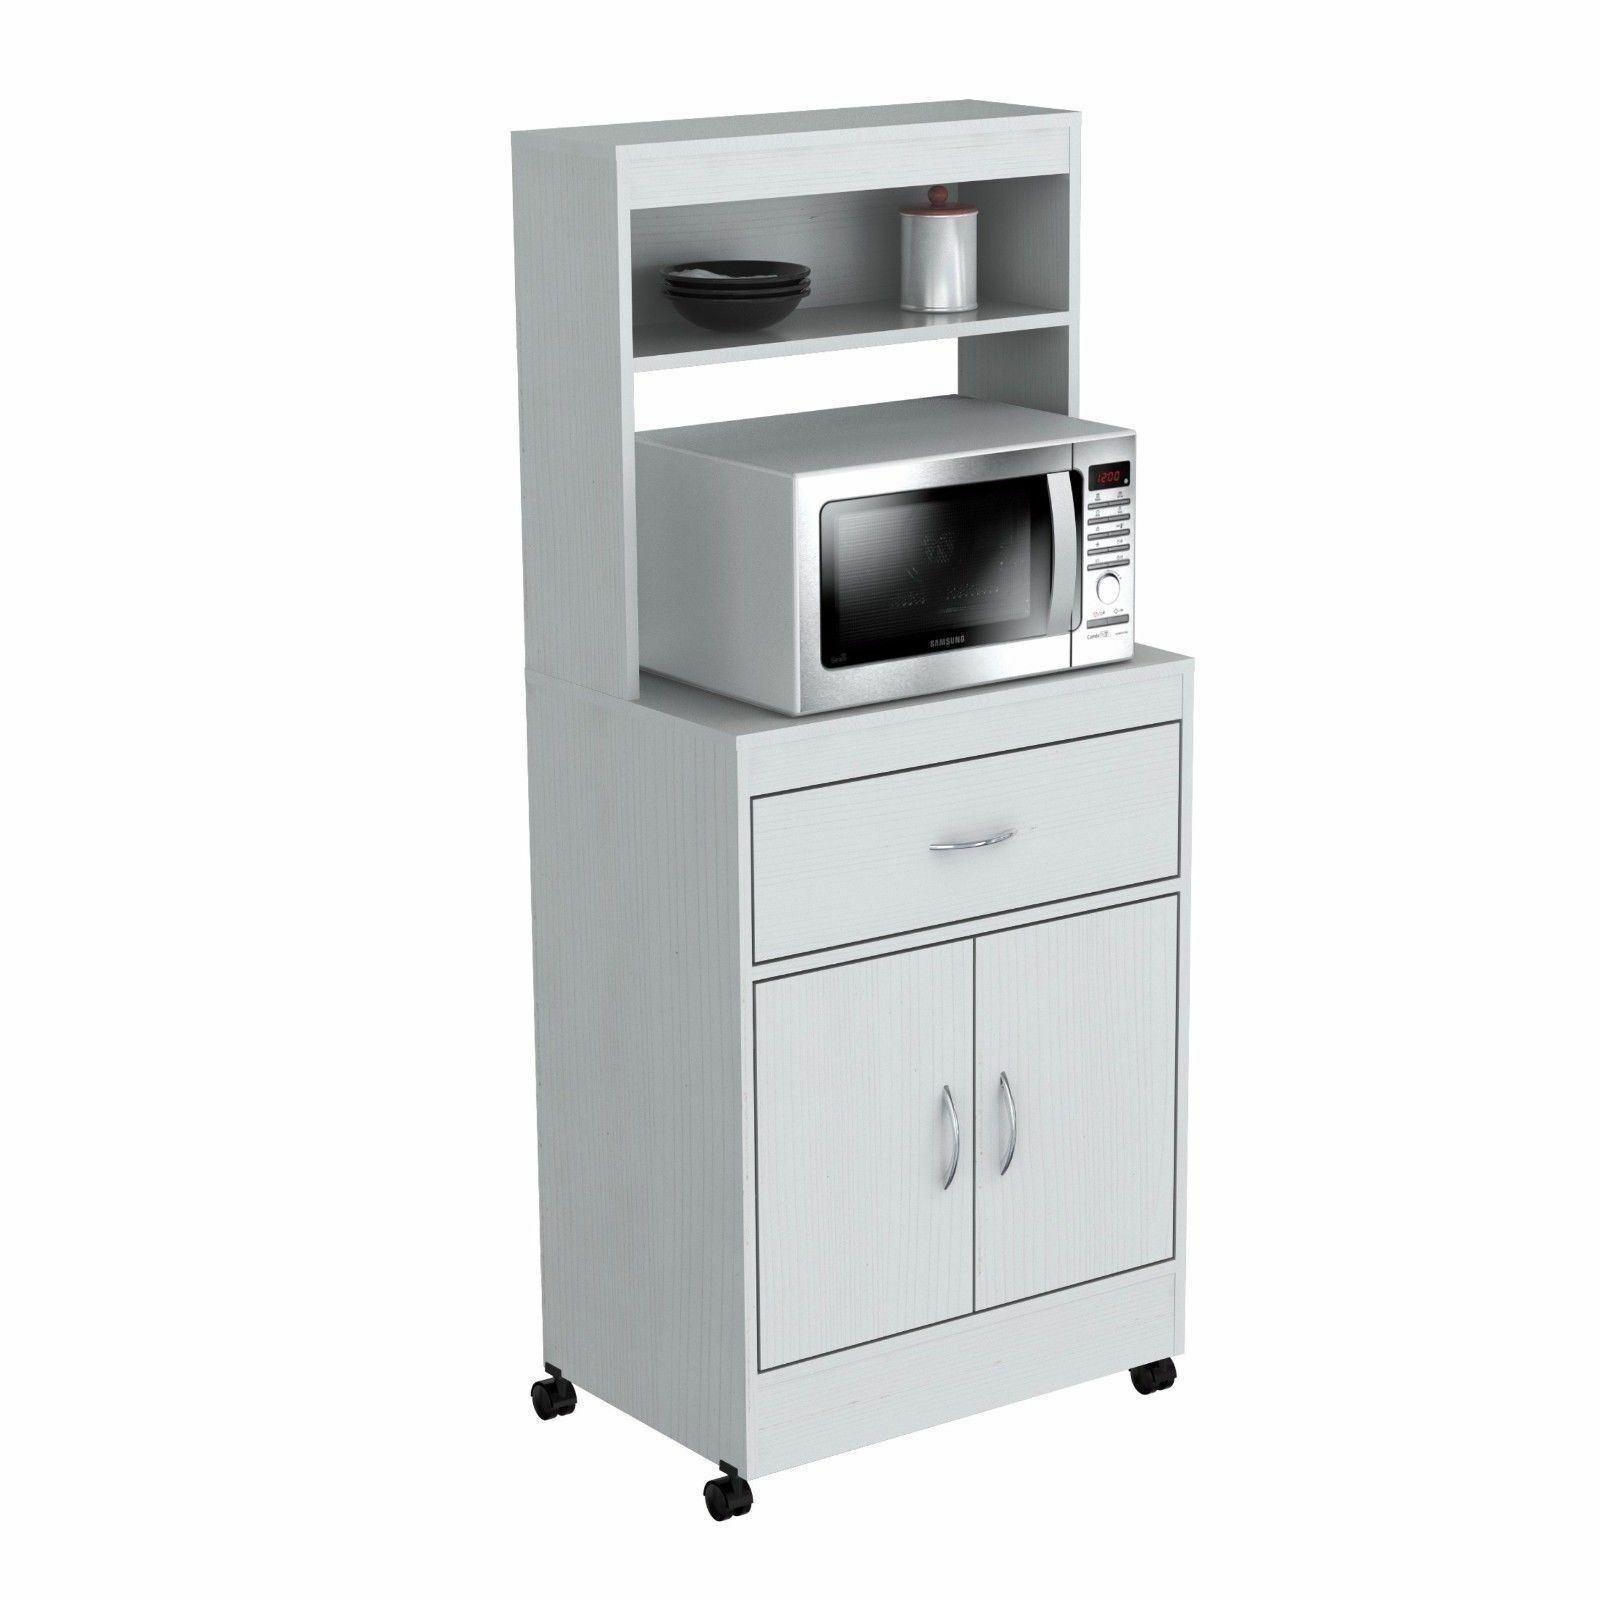 White Wood Tall Microwave Cart Kitchen Storage Cabinet